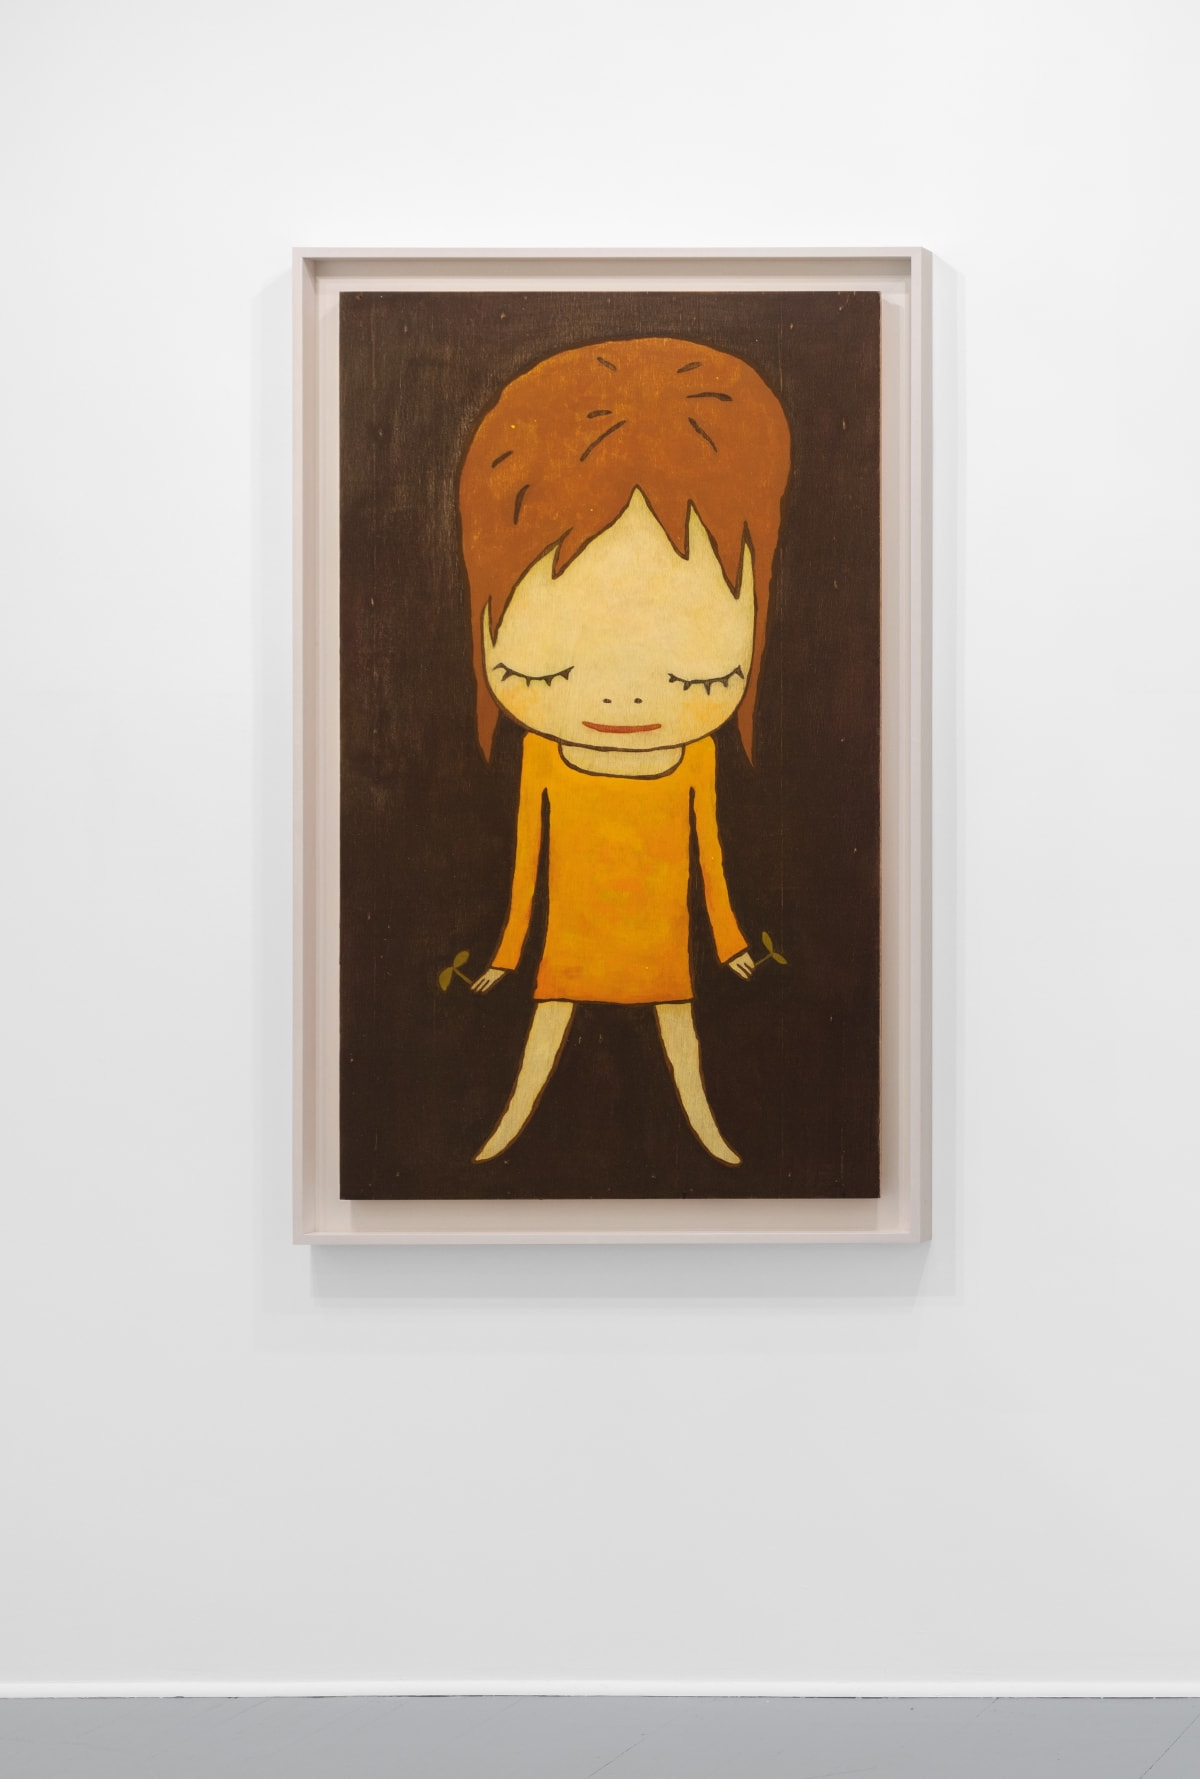 Yoshitomo Nara Sprout in Hands, 2011 Acrylic on Wood 53 3/8 x 32 1/4 in (135.6 x 81.9 cm) © YOSHITOMO NARA